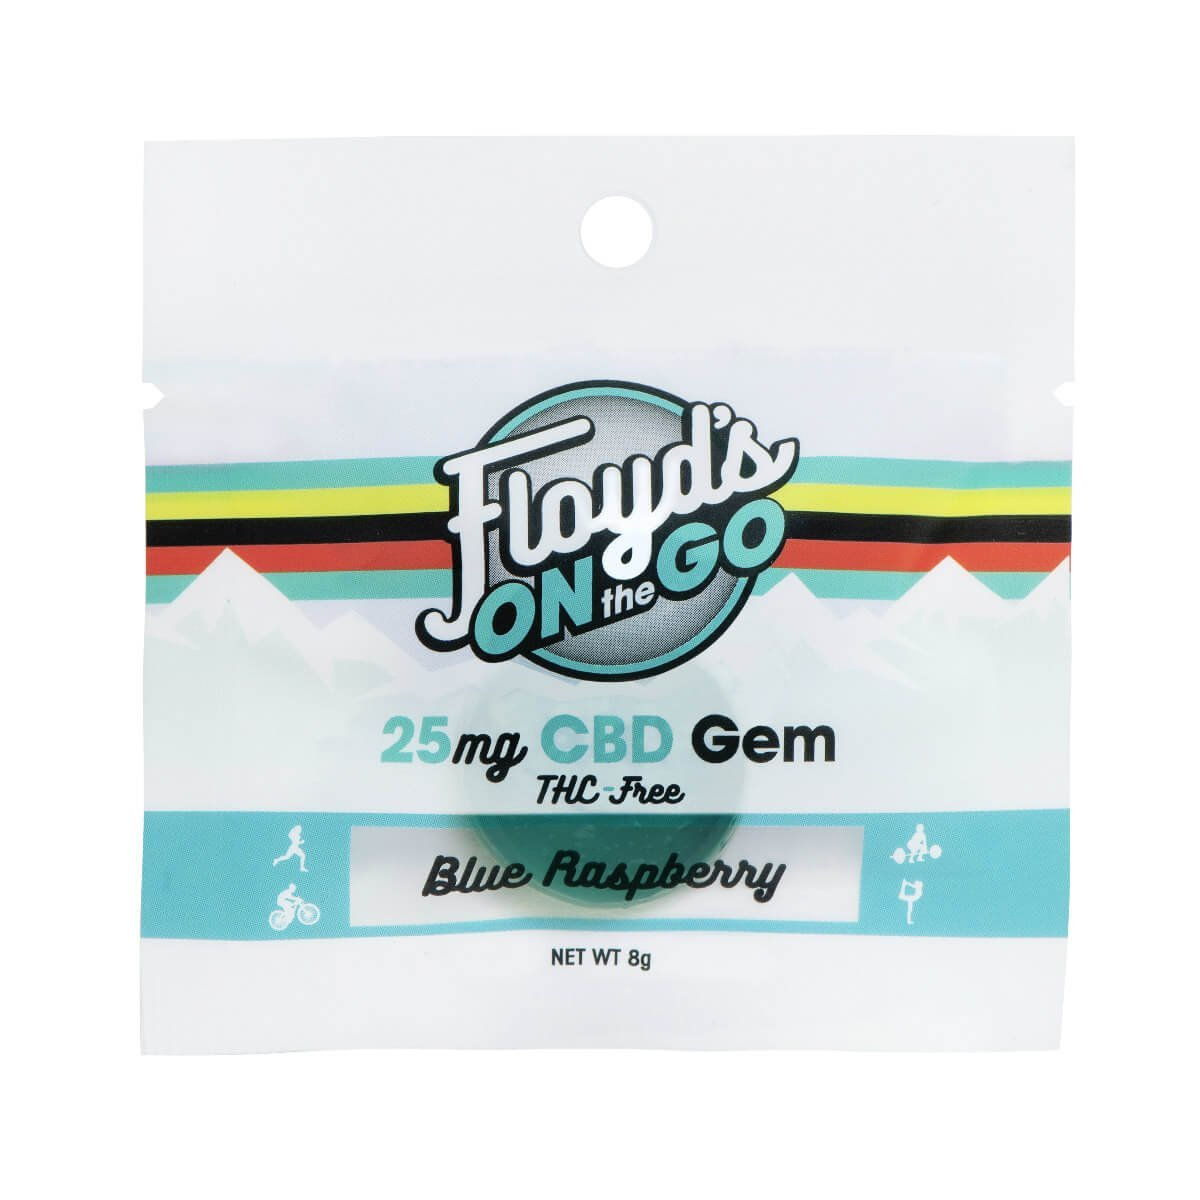 Floyd's of Leadville Blue Raspberry CBD Gems, 25mg